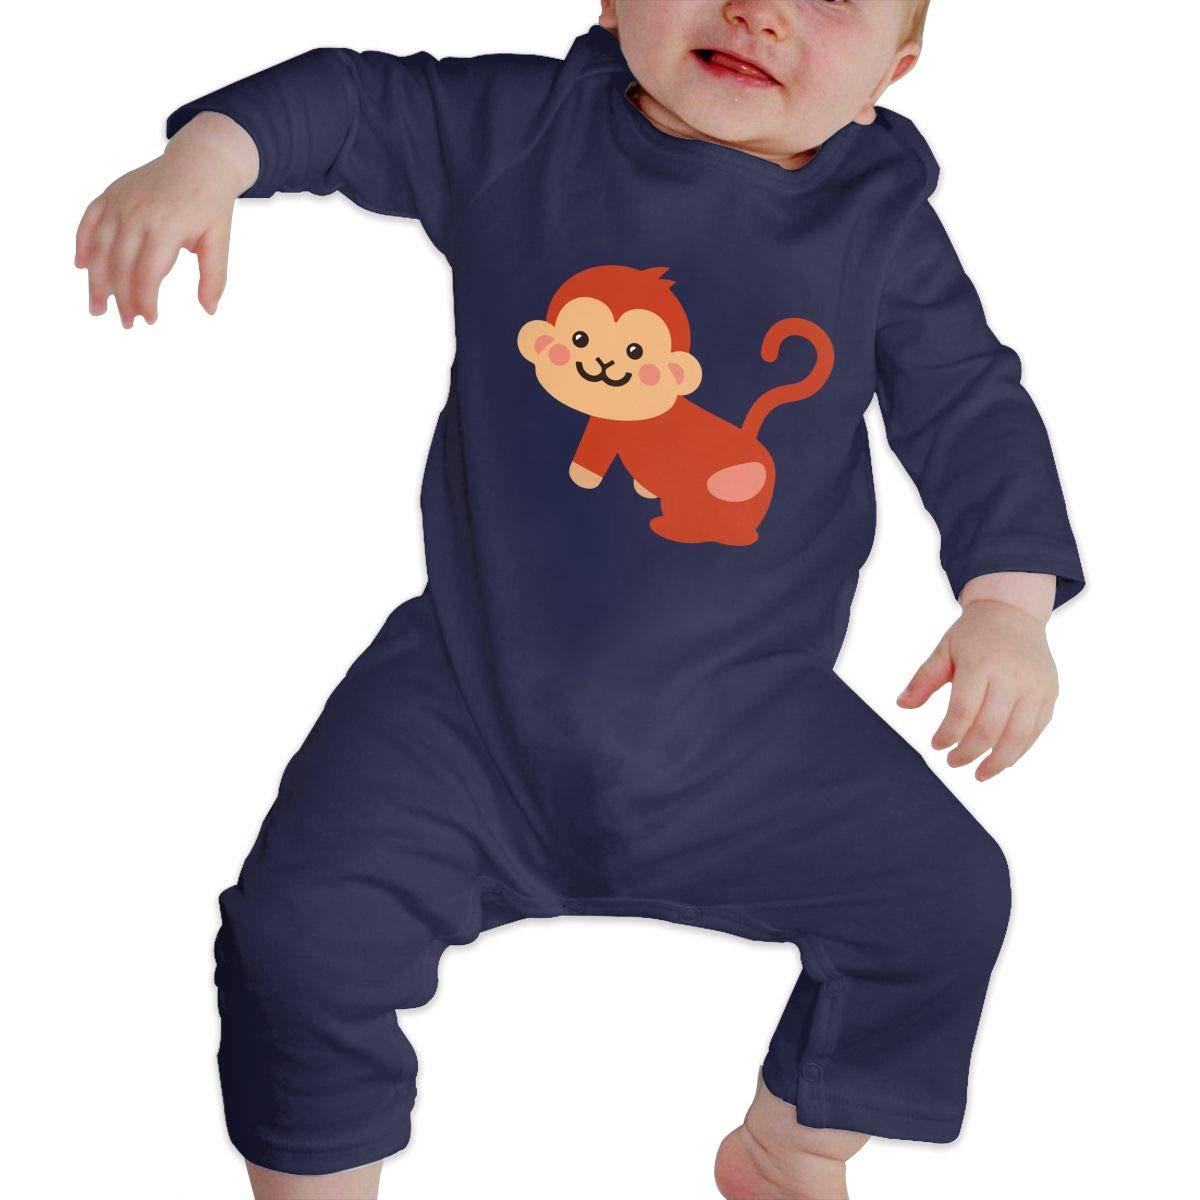 Warm Monkey Cotton Sleepwear Db84UR@5p Infant Baby Girls Boys Long Sleeve Bodysuit